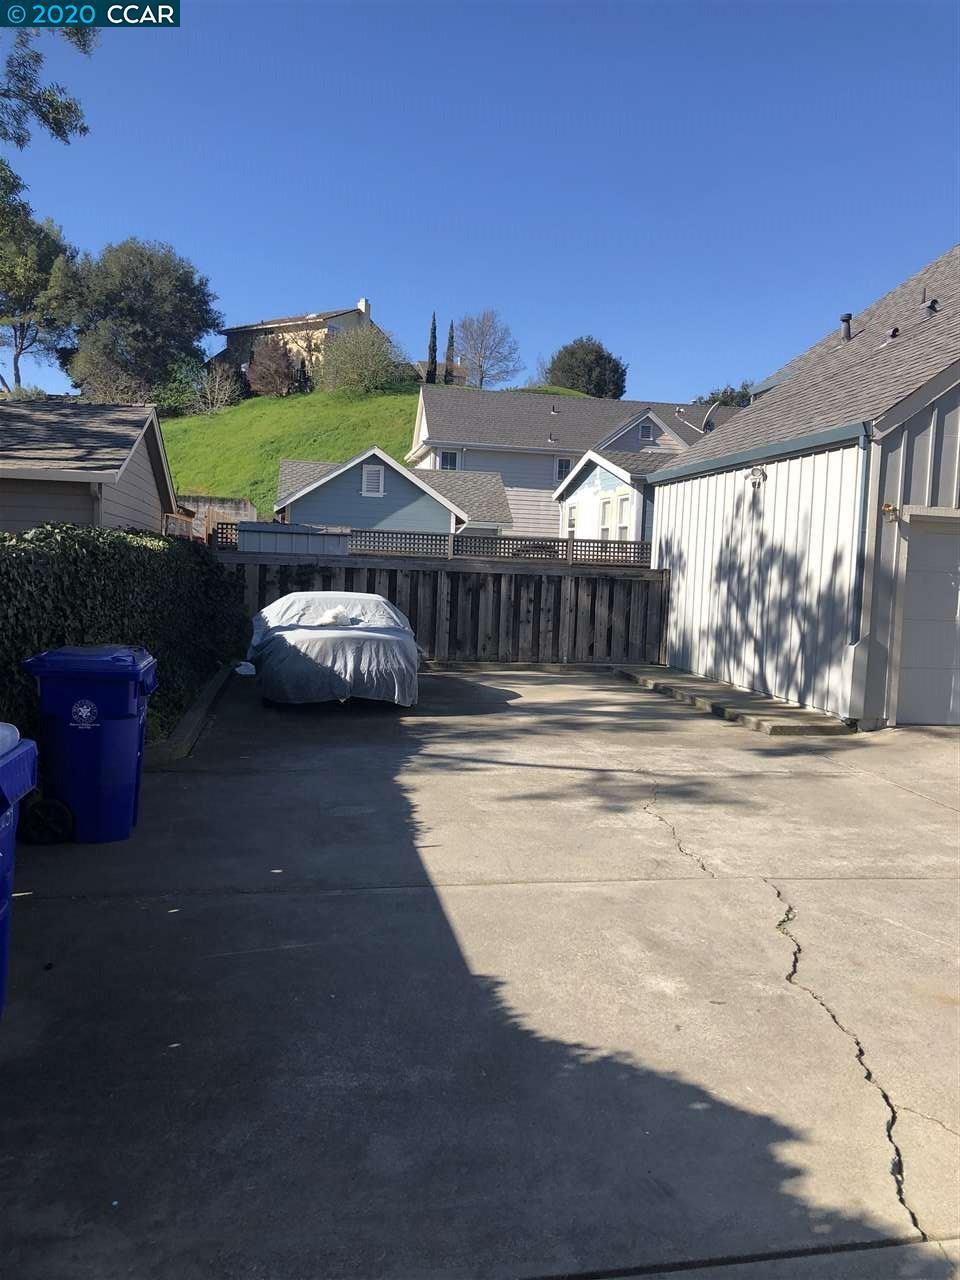 Photo of 2209 Prune St #2209 Prune, PINOLE, CA 94564 (MLS # 40897569)